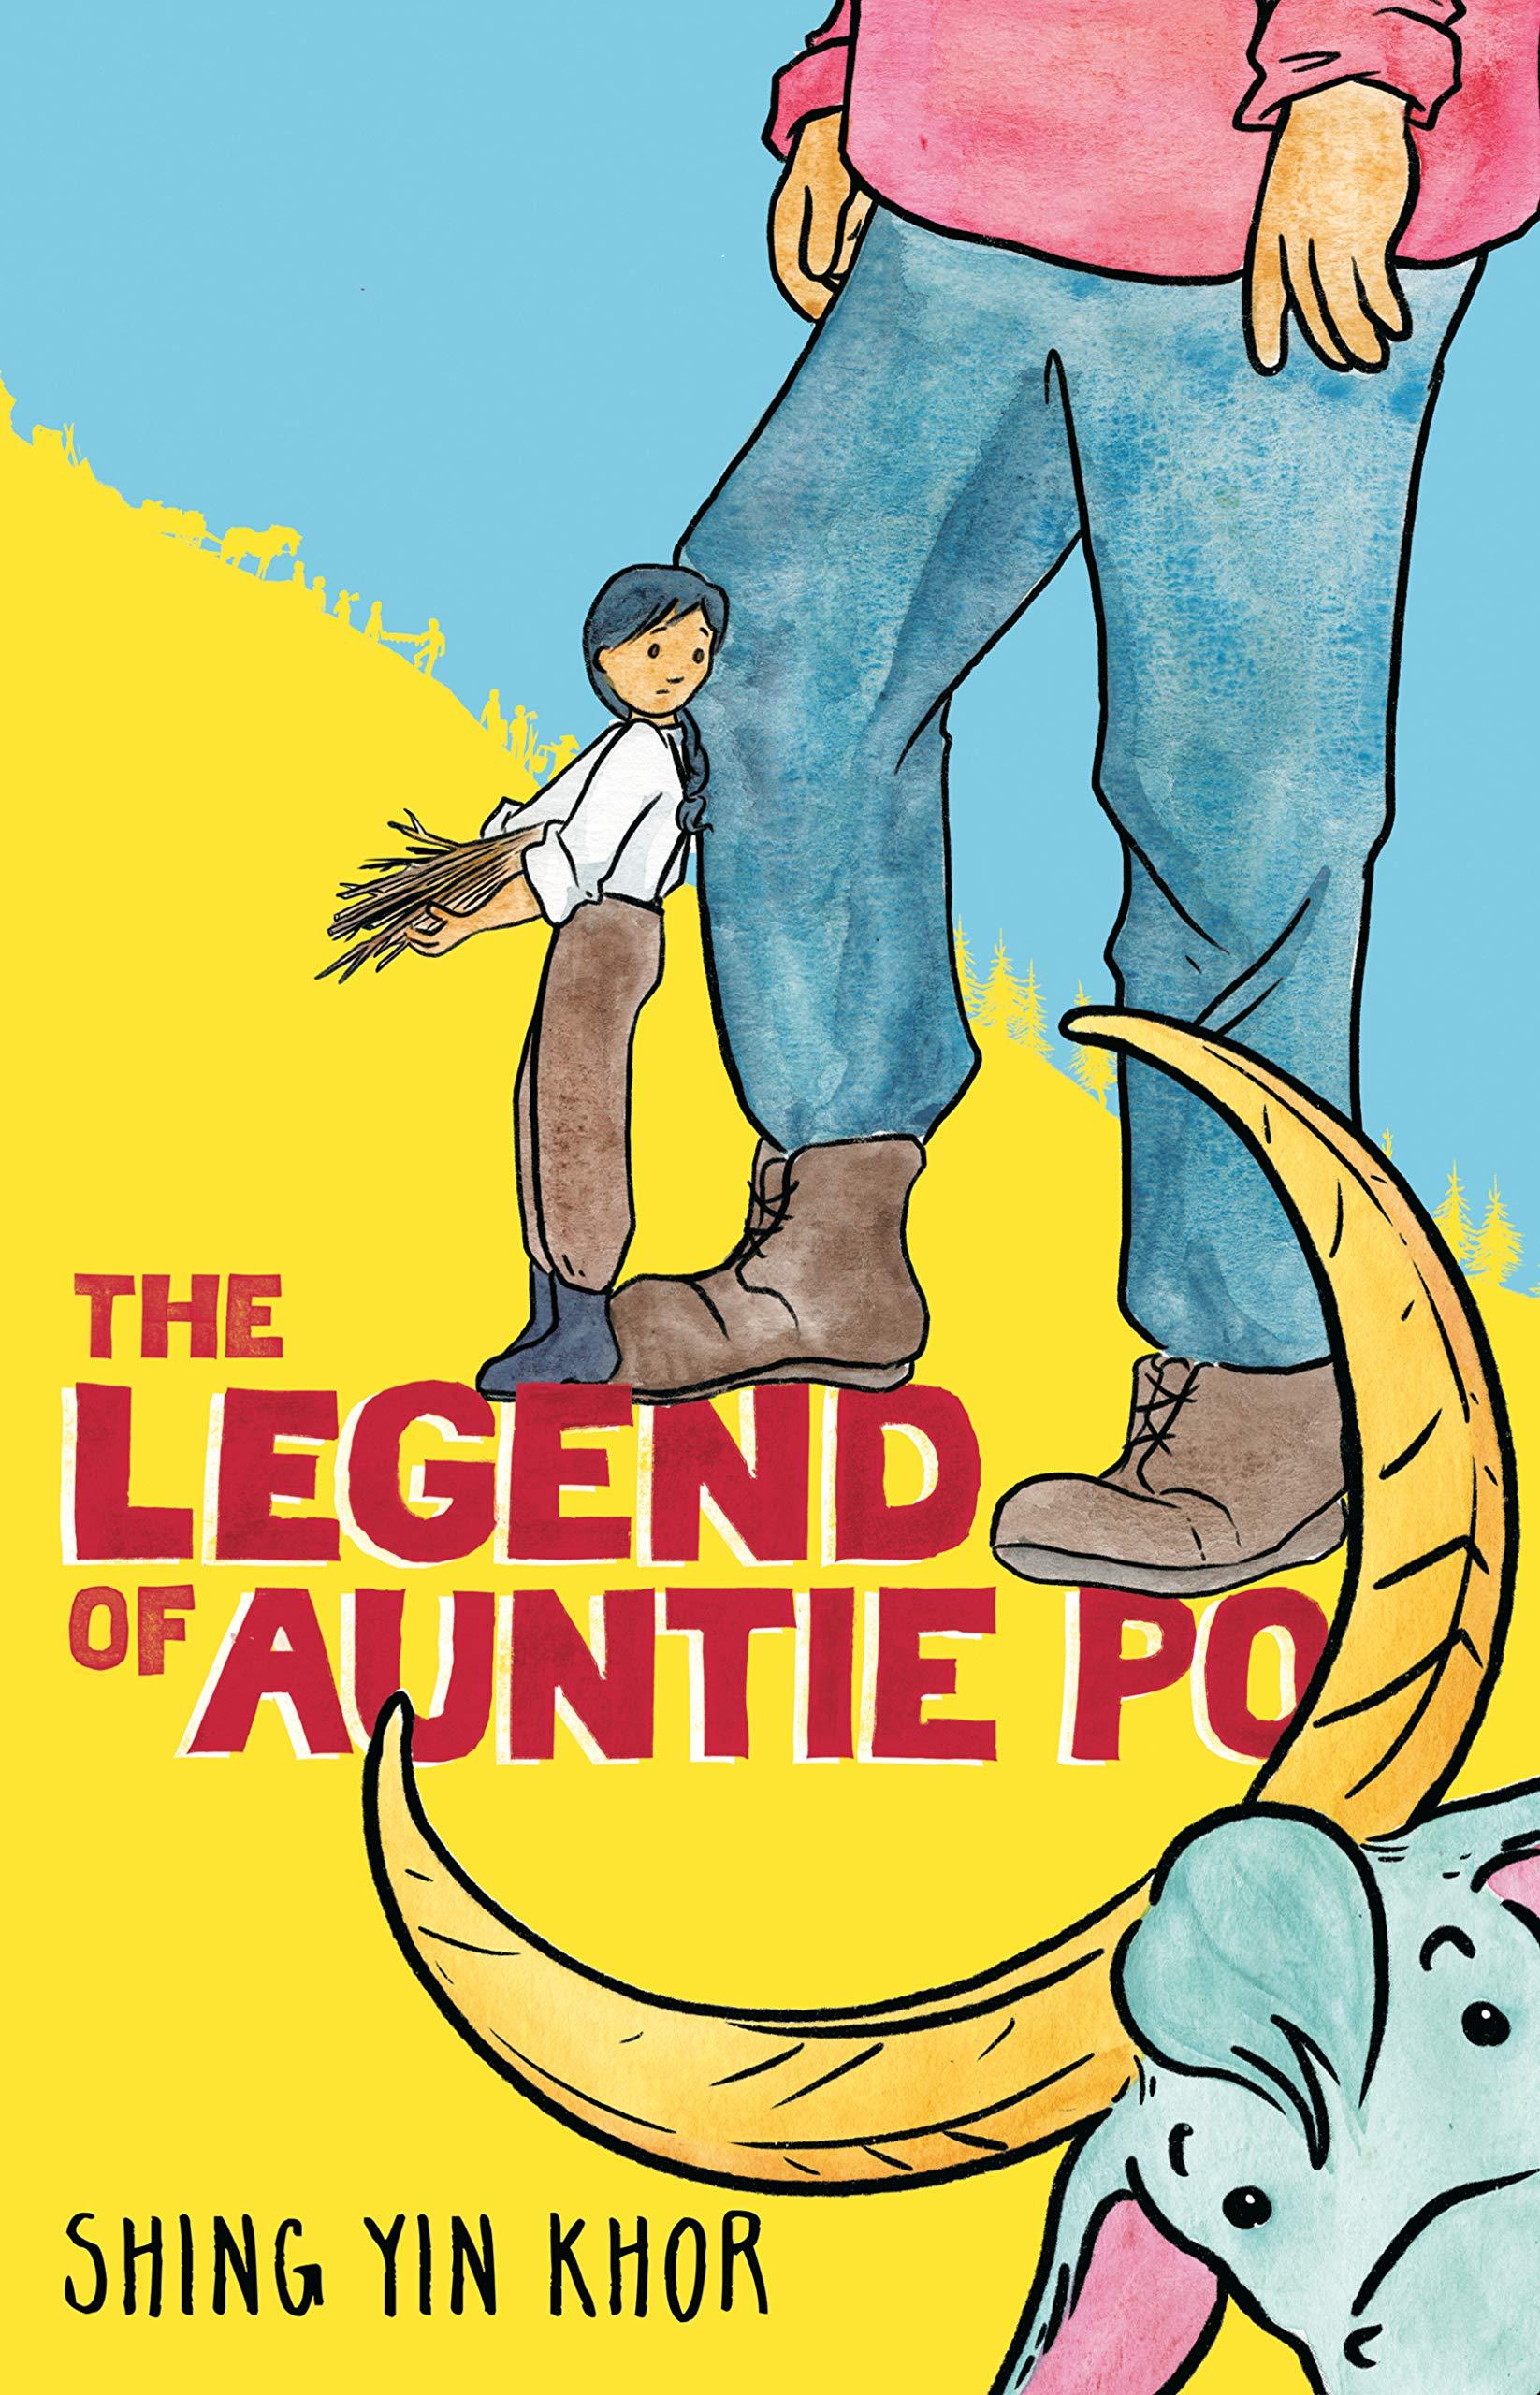 The Legend of Auntie Po: Khor, Shing Yin: 9780525554882: Amazon.com: Books